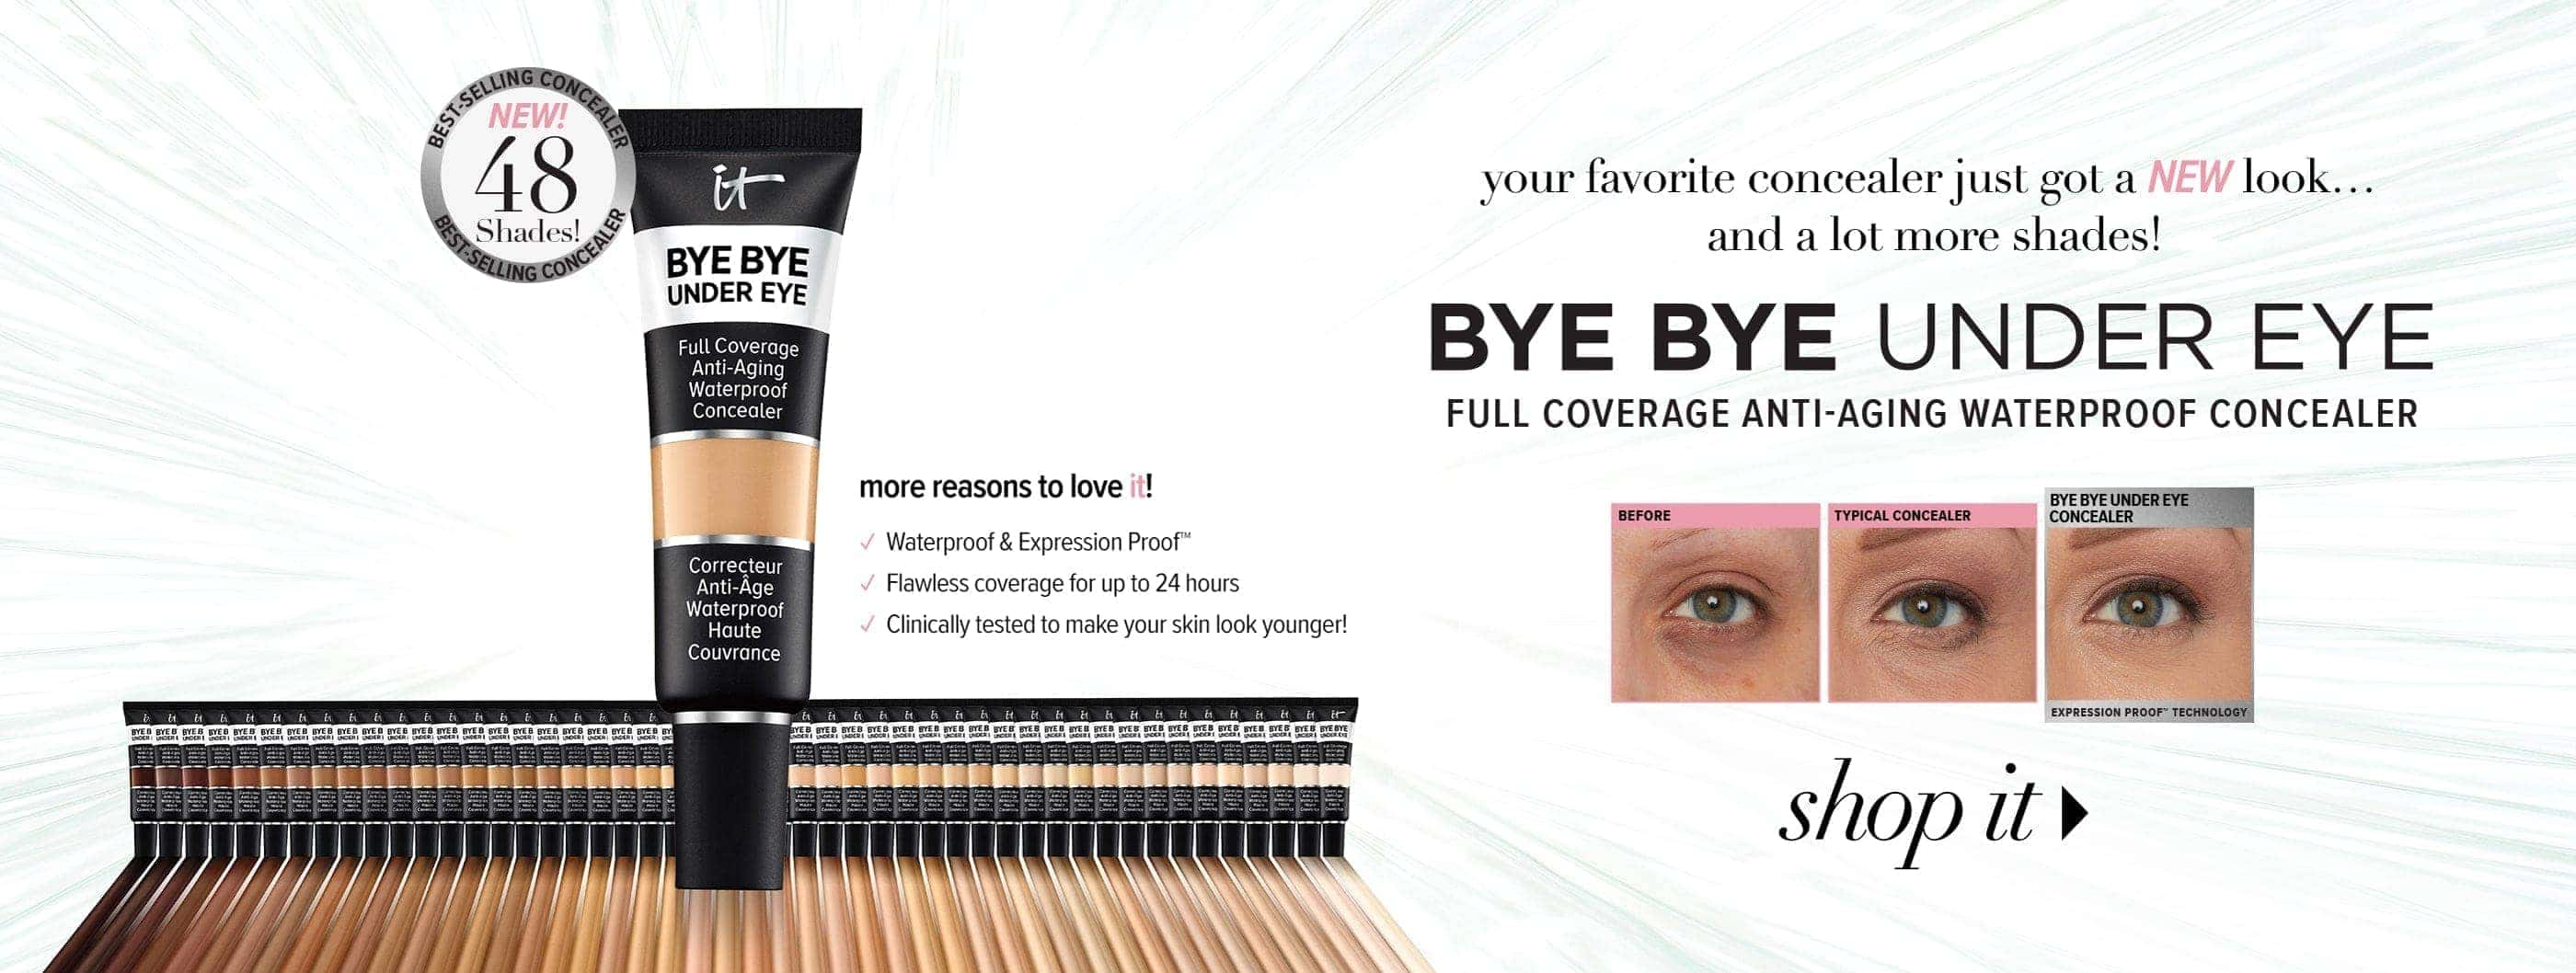 Bye Bye Under Eye - Now in 48 Shades